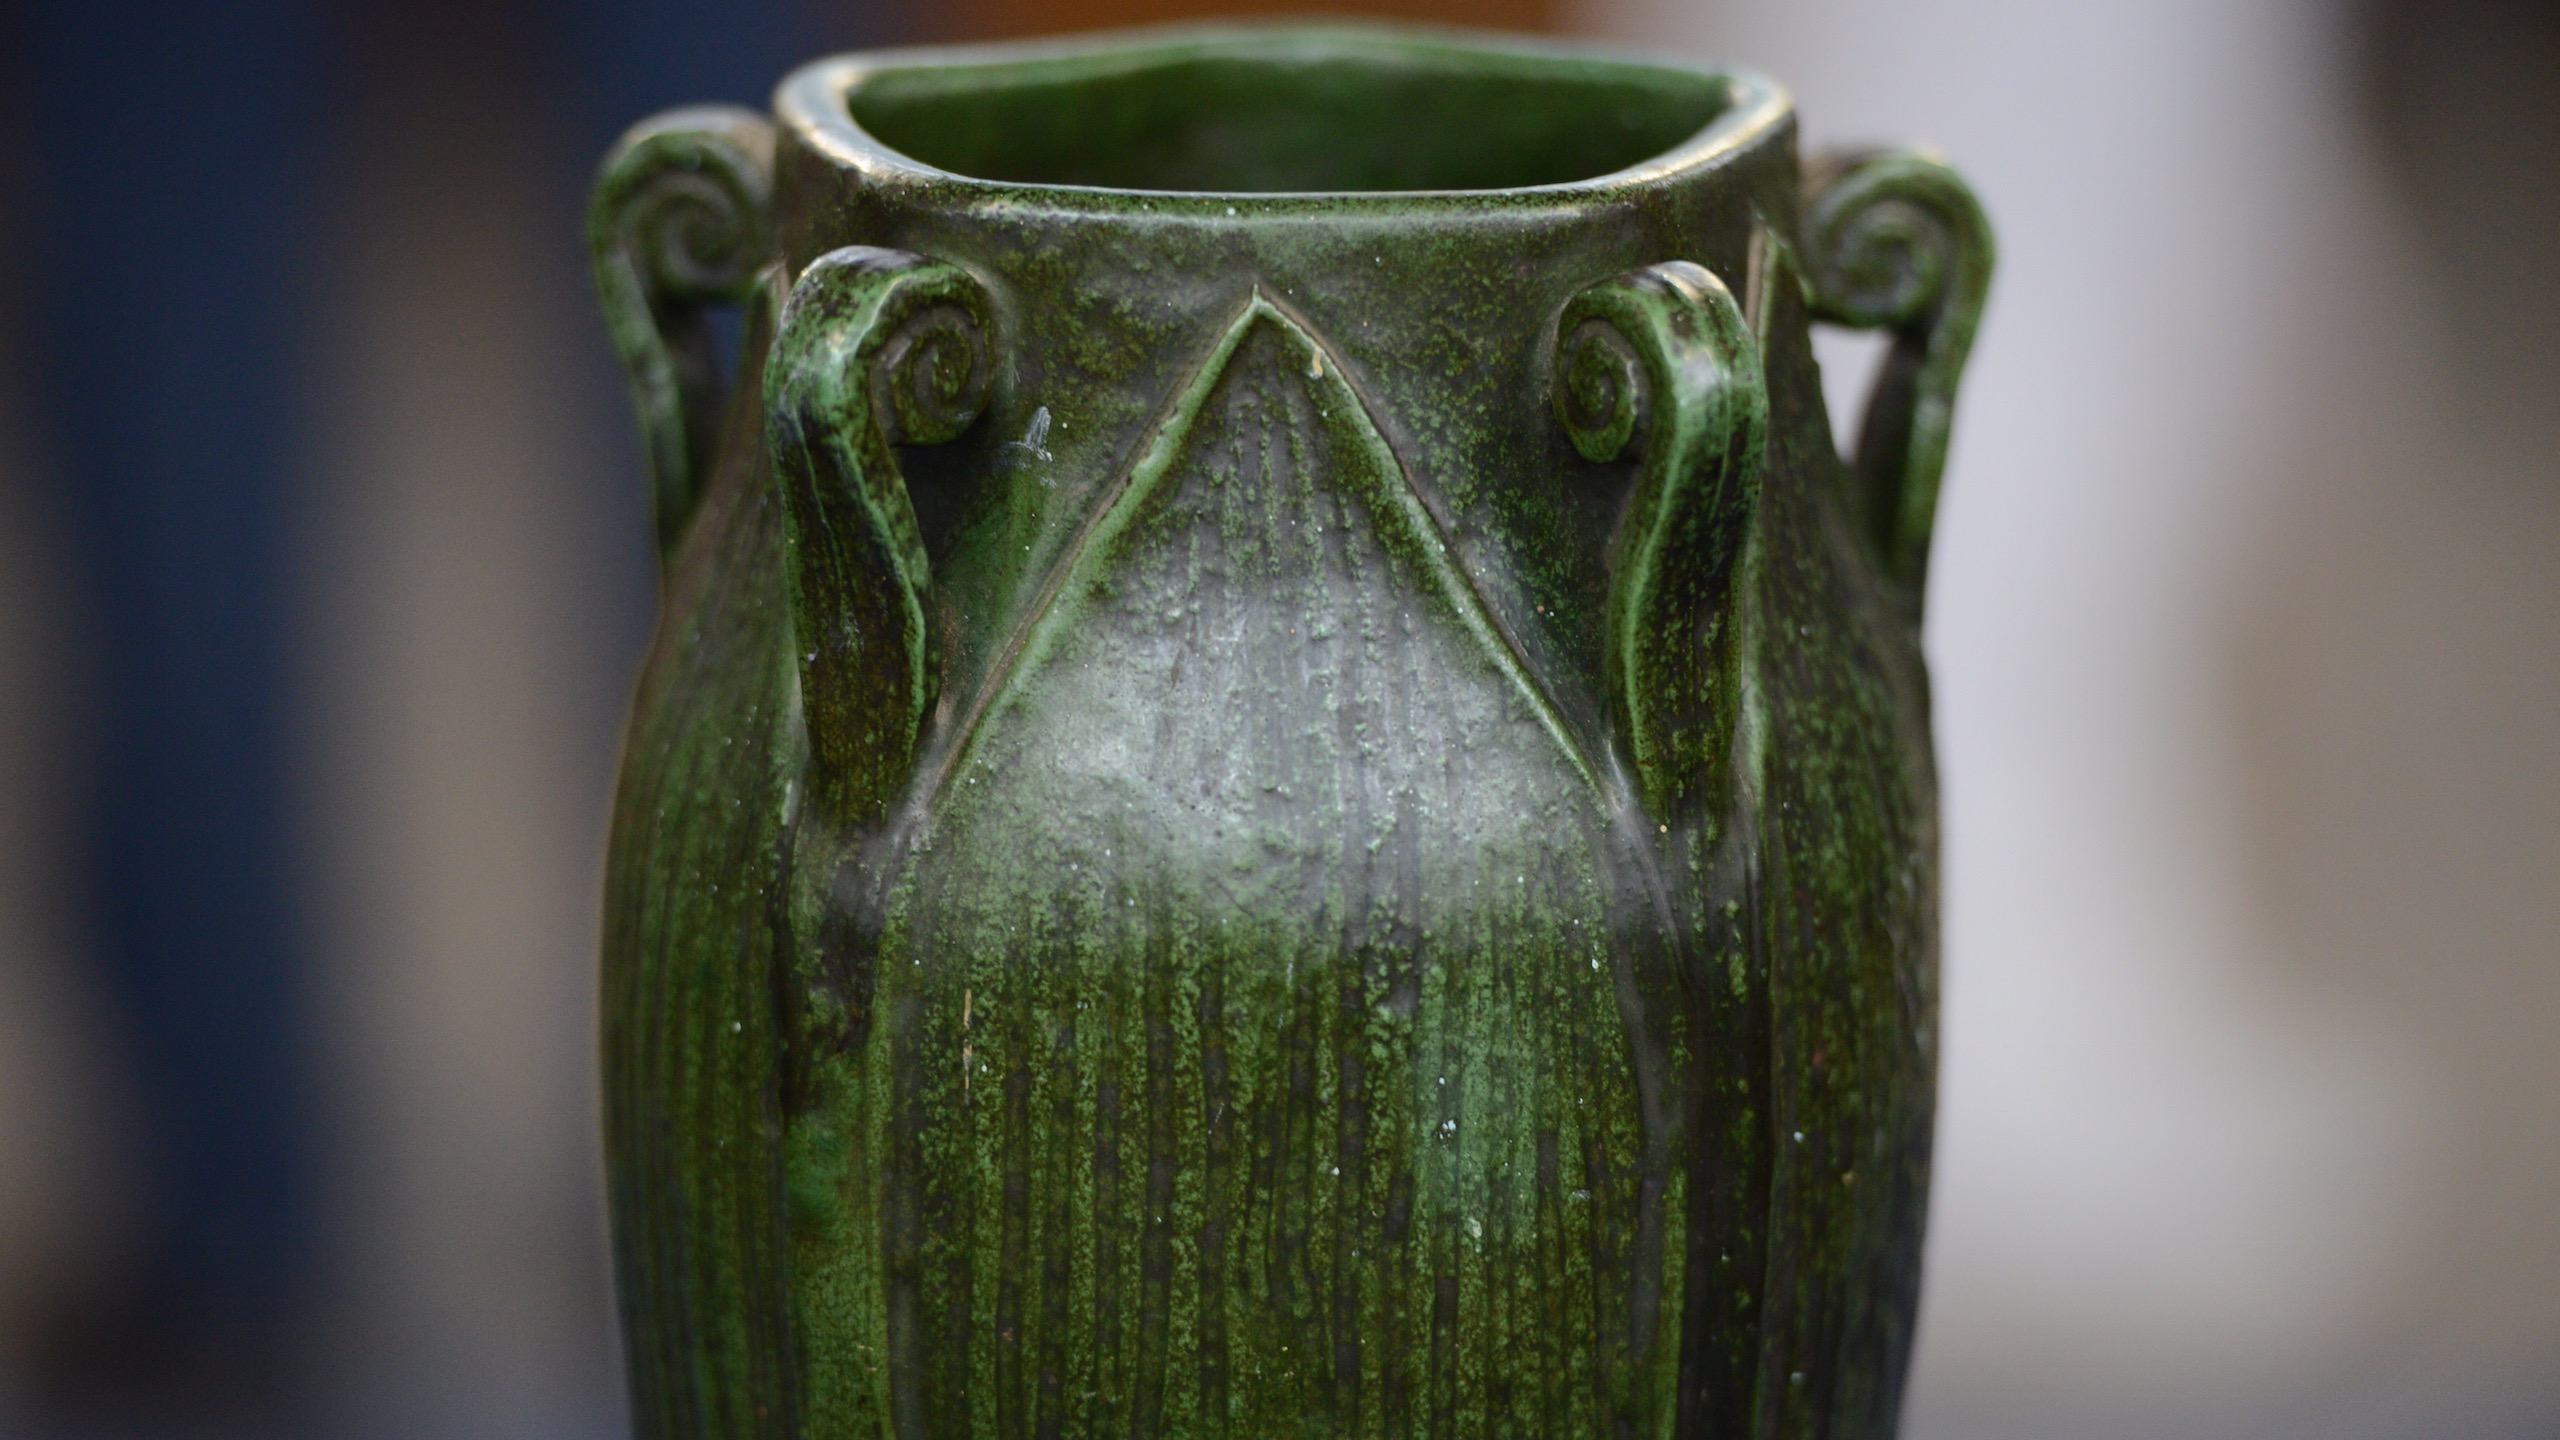 https://www-tc.pbs.org/prod-media/antiques-roadshow/article/images/tomas-wheatley-vase-cu.jpg